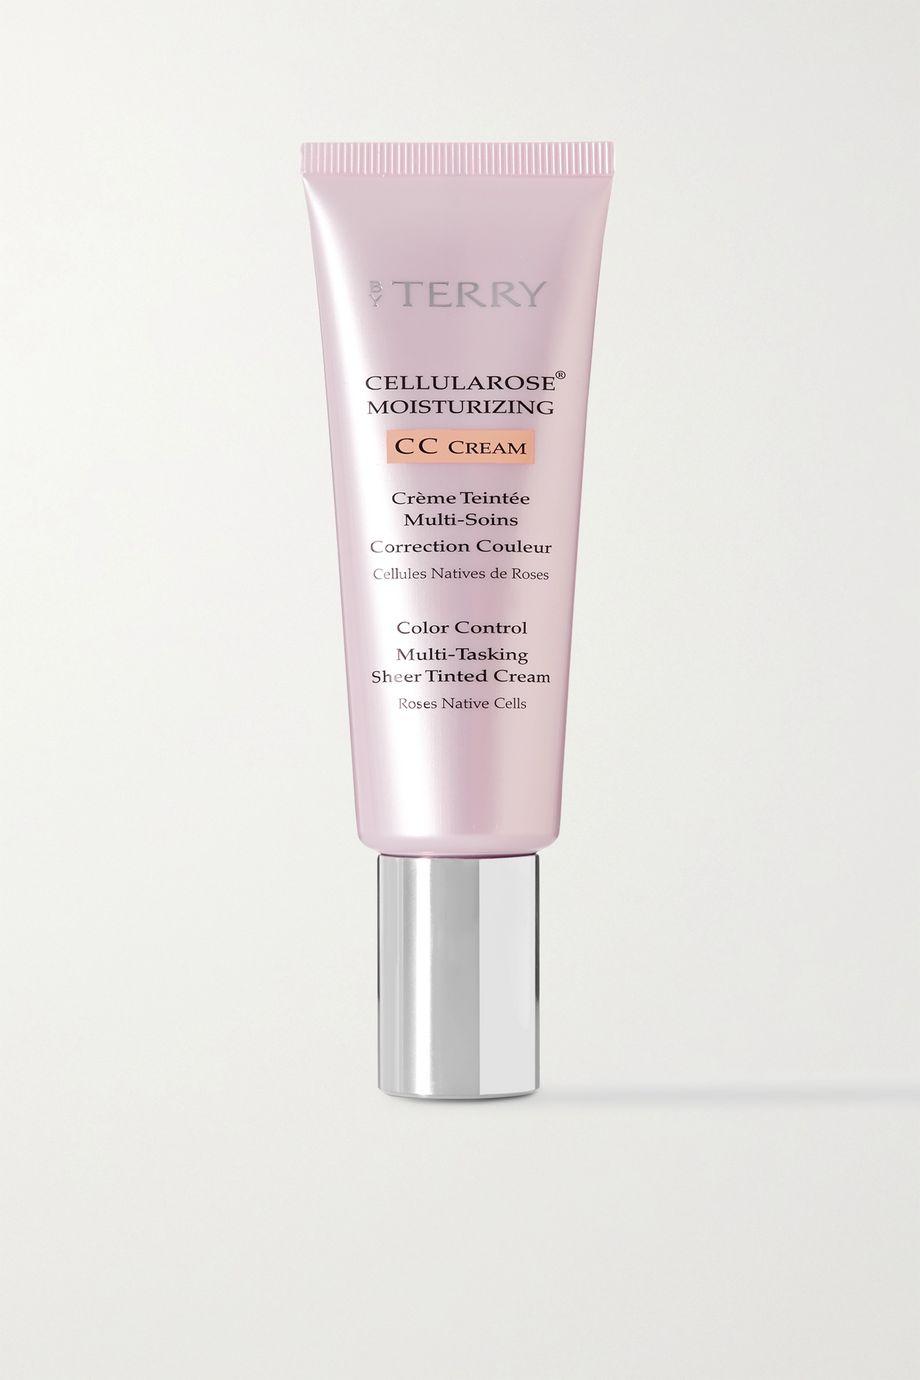 BY TERRY Cellularose® Moisturizing CC Cream - Beige 3, 40g